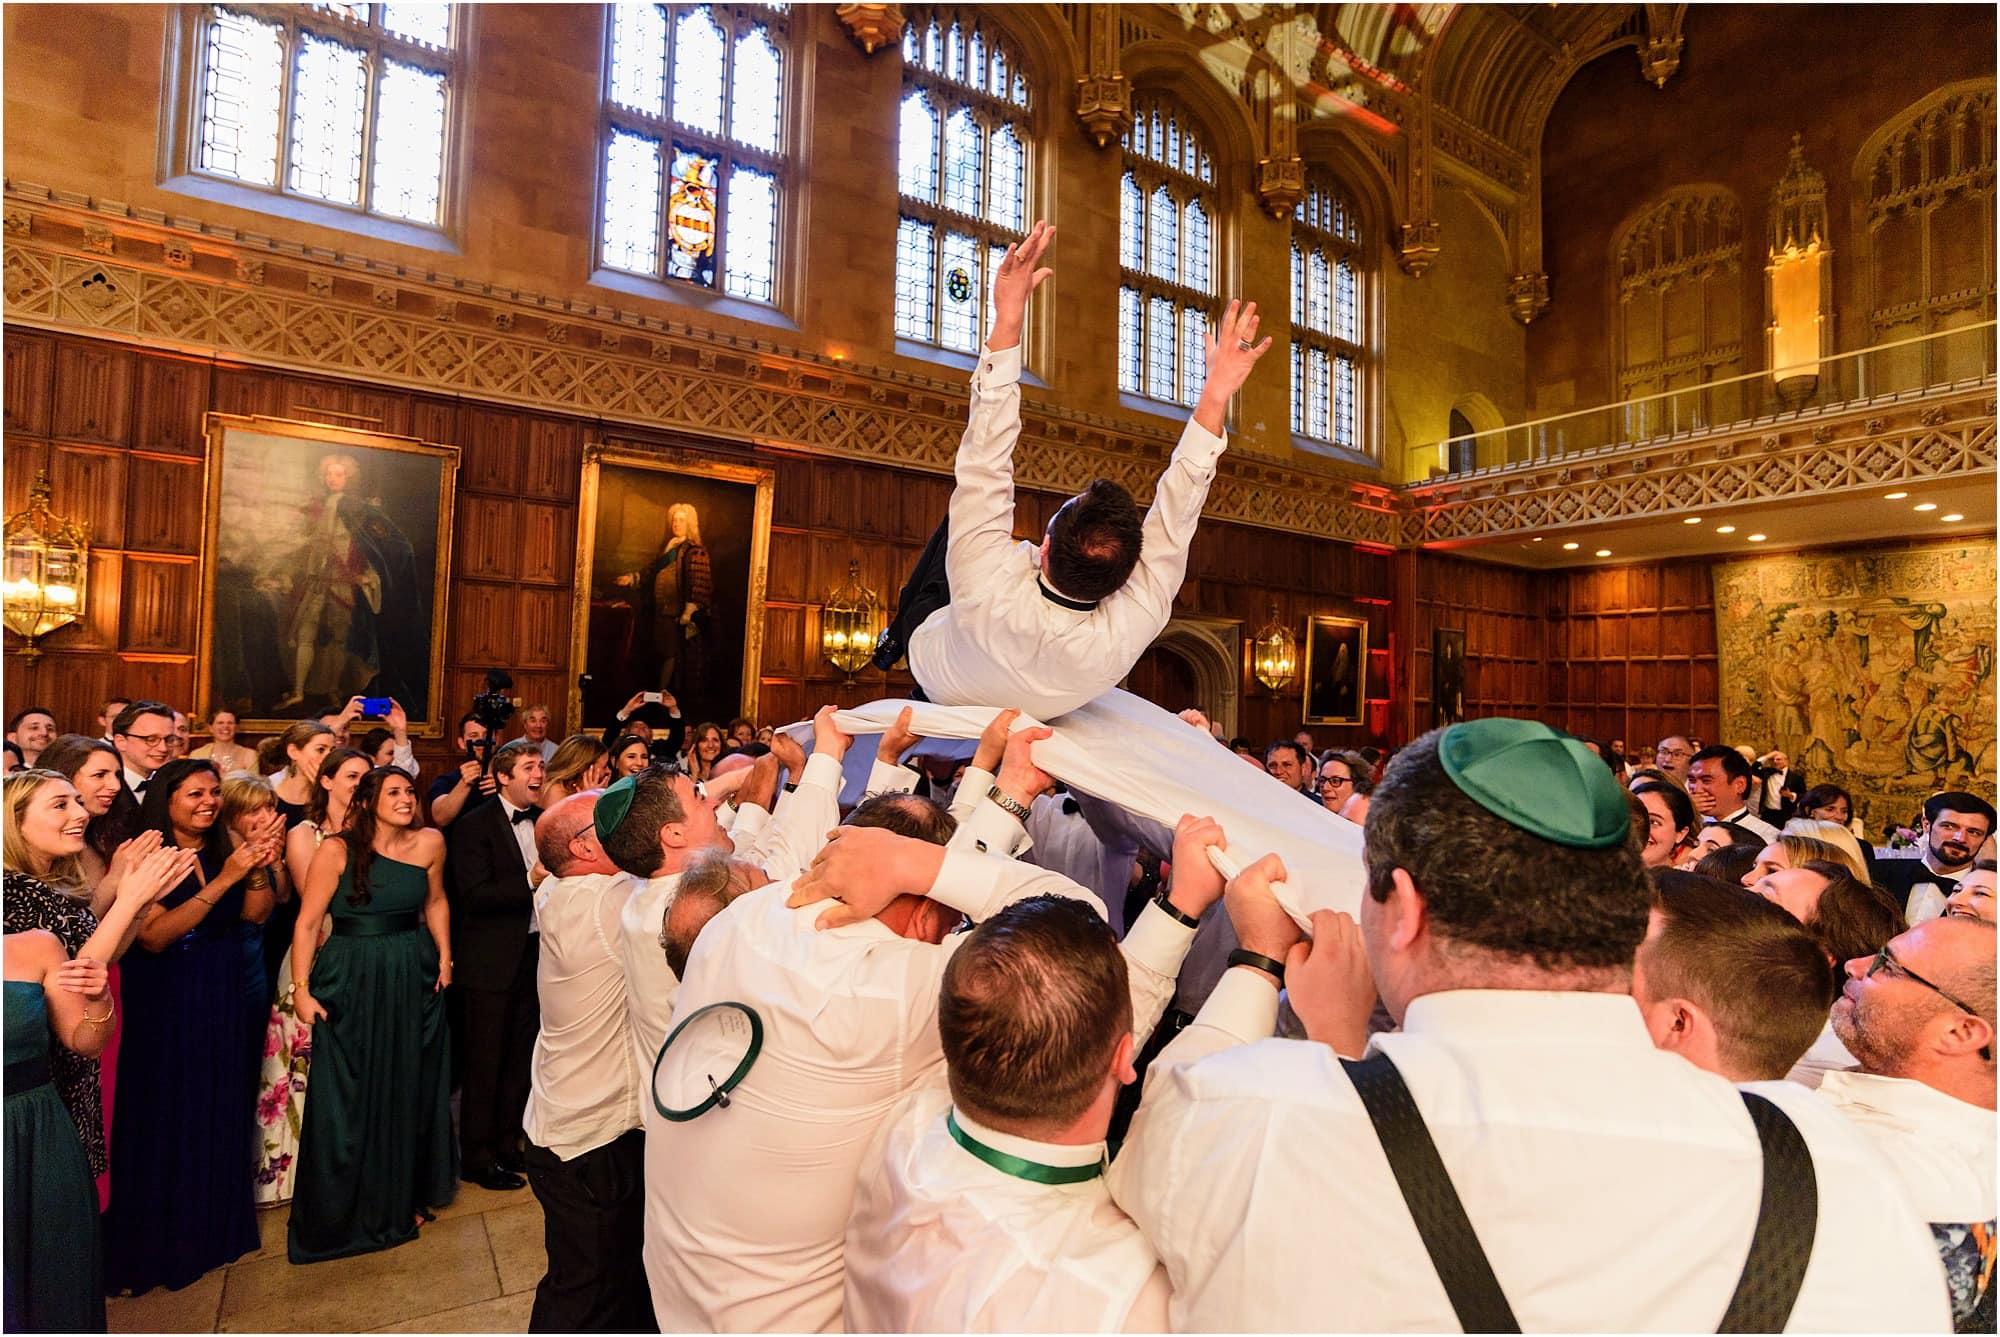 Israeli dancing groom thrown into the air and loses his kippah